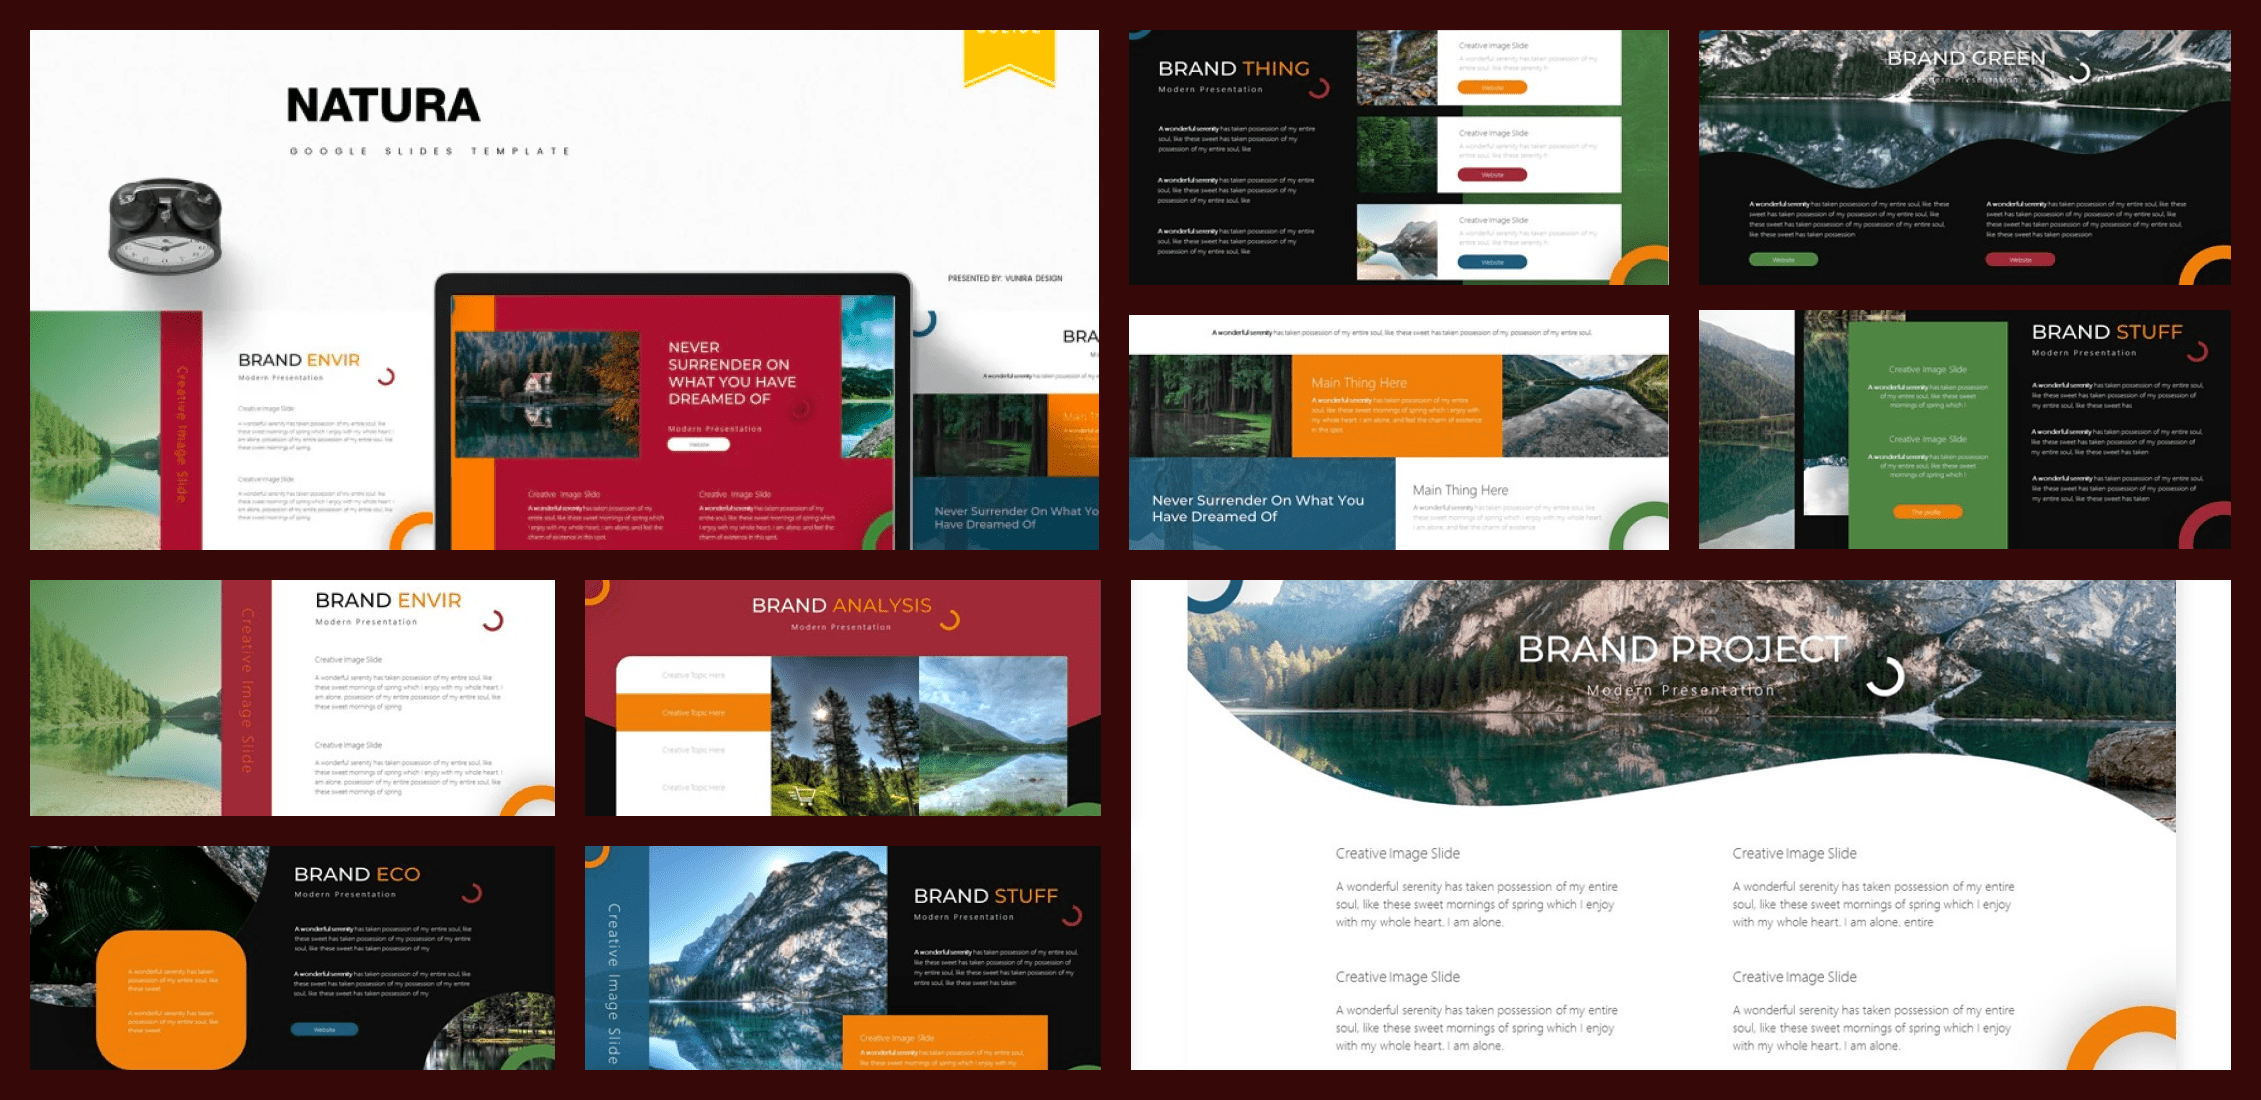 50+ Free and Premium Simple Google Slides Themes in 2021 - simple google slides theme 28